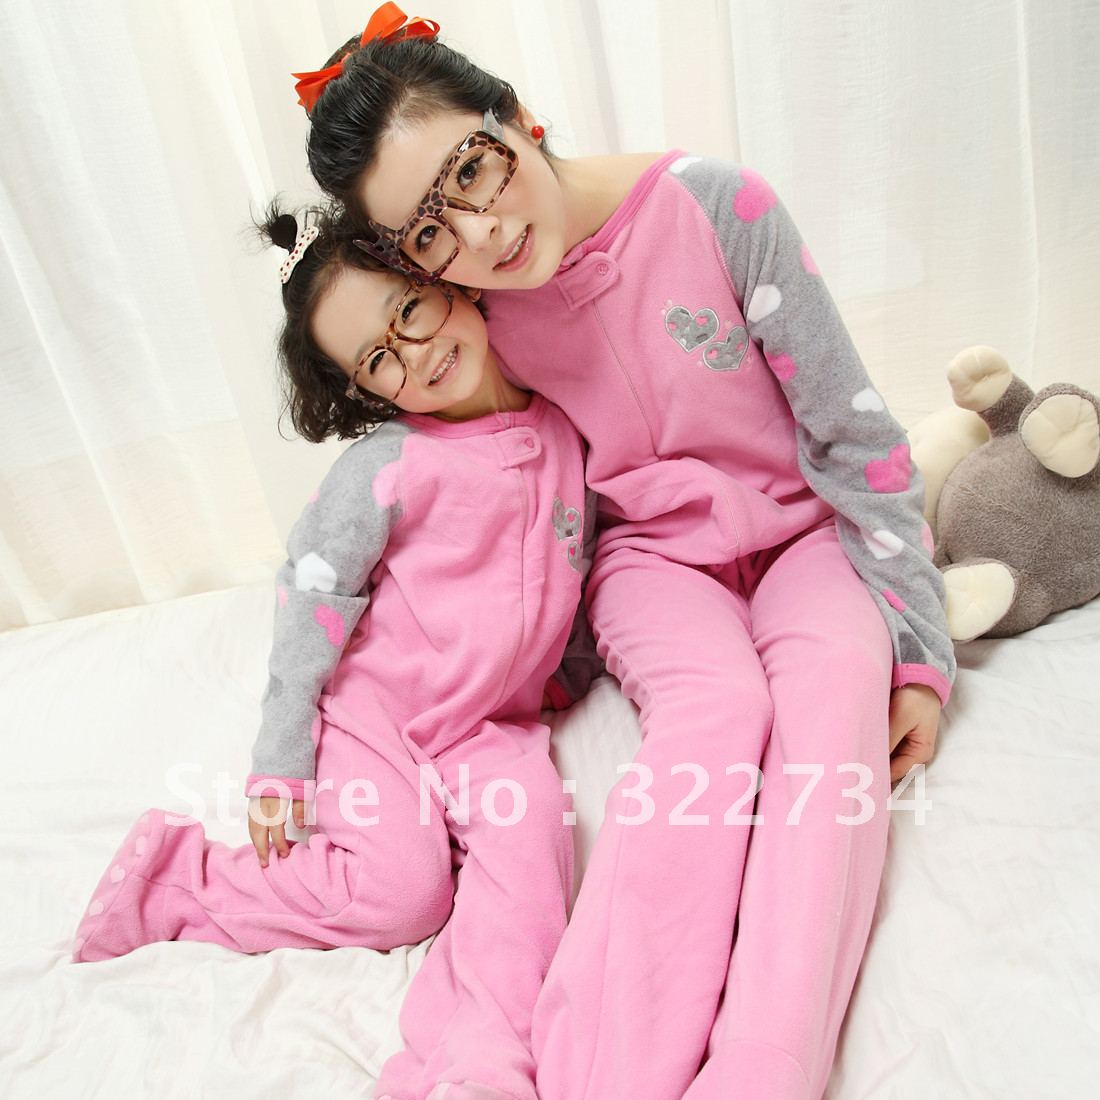 footed pajamas women and girls one piece sleepwear cartoon spring and autumn romper sleeping bag